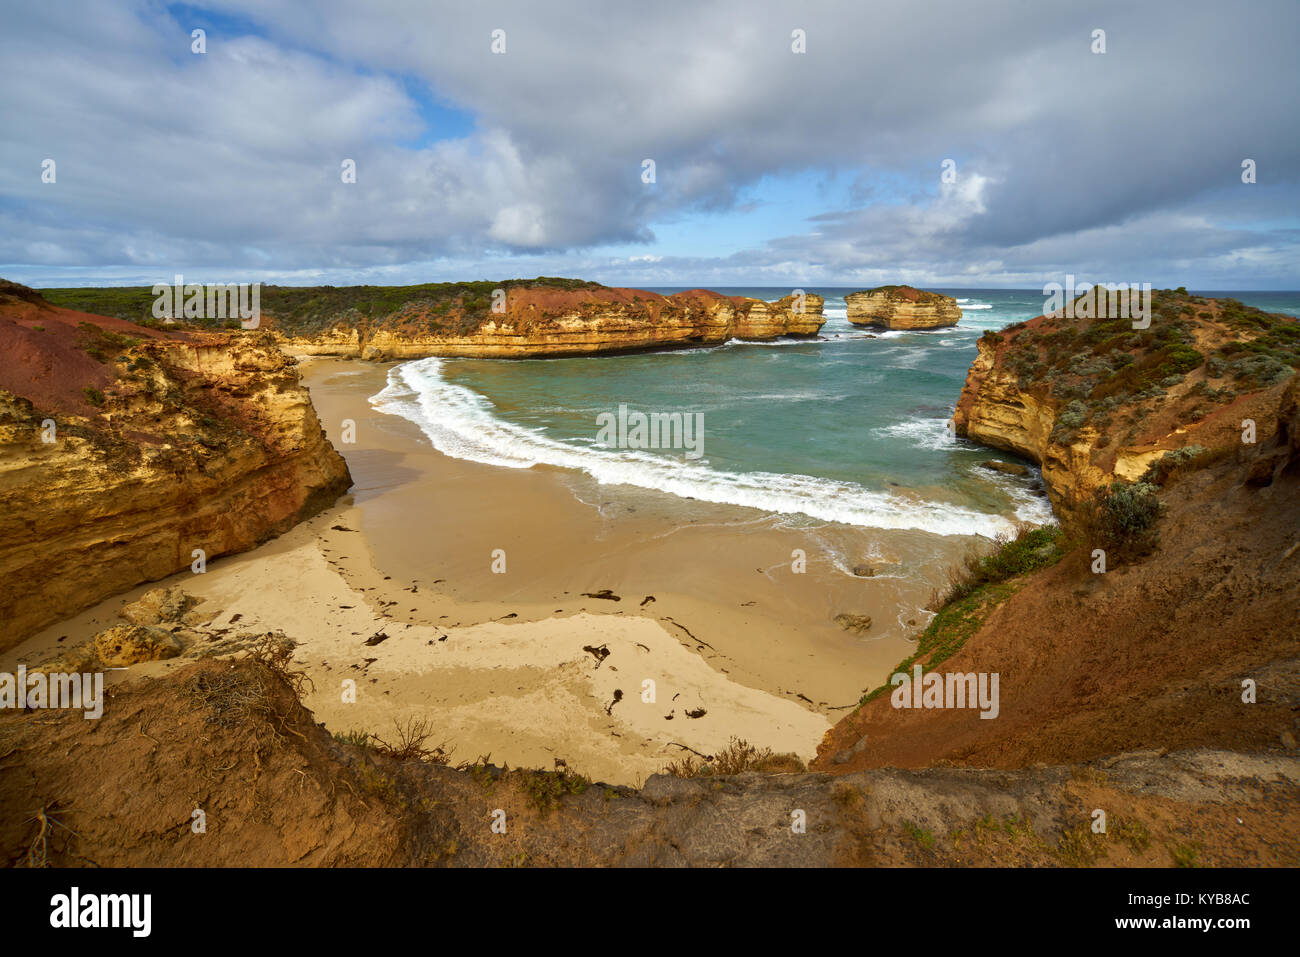 Along The Great Ocean Road Australia, Victoria, Australia. Stock Photo